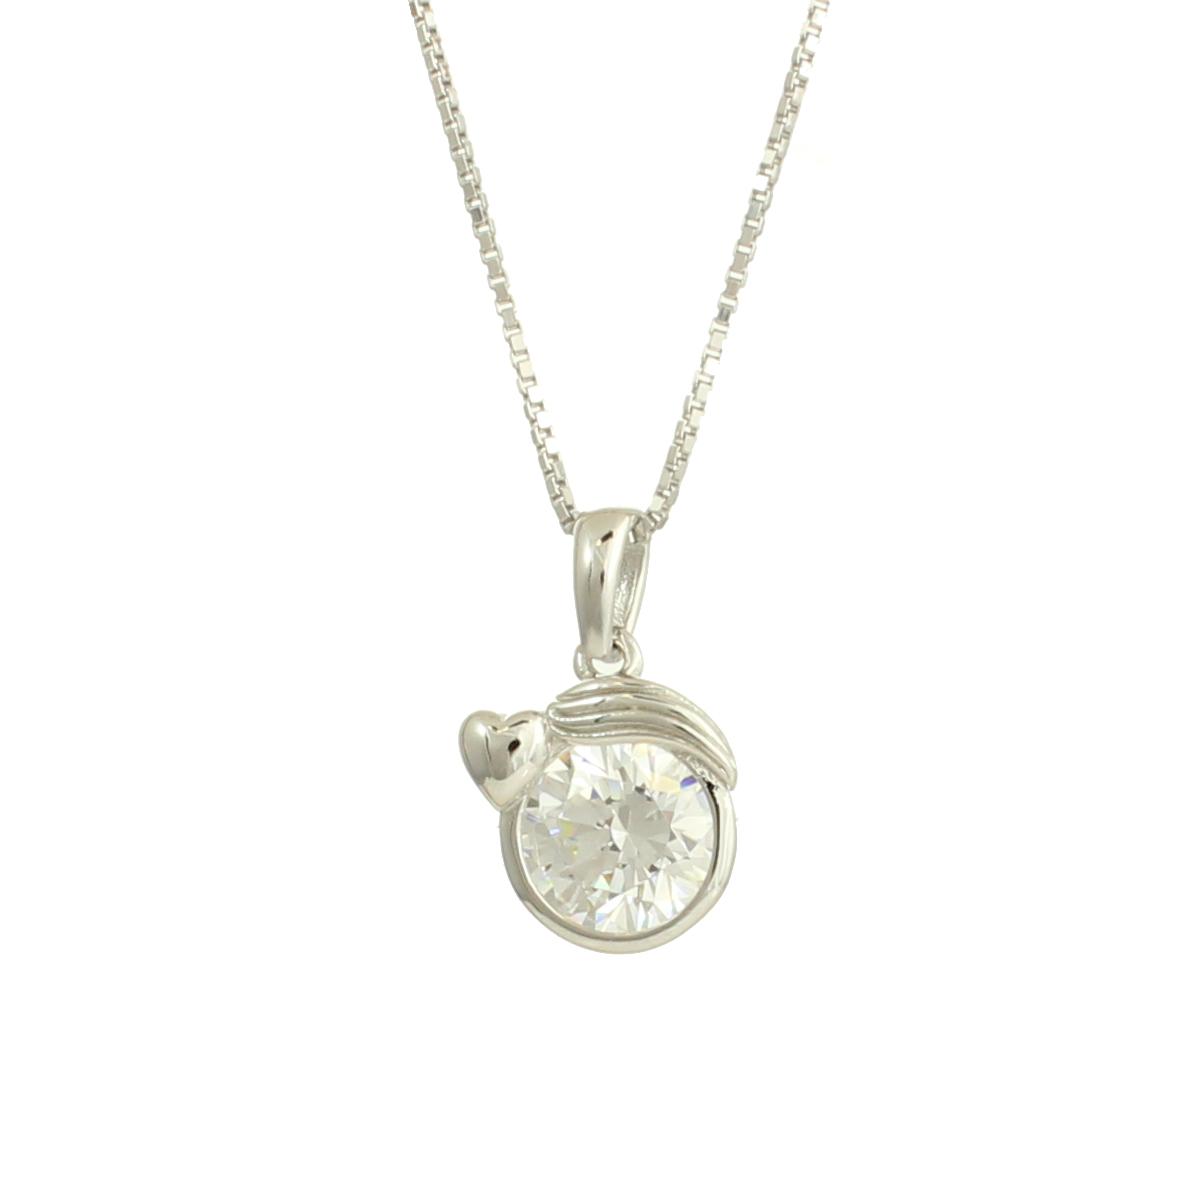 Rhodium Plated 925 Sterling Silver Swarovski Cubic Zirconia Zodiac Virgo Fashion Pendant Necklace